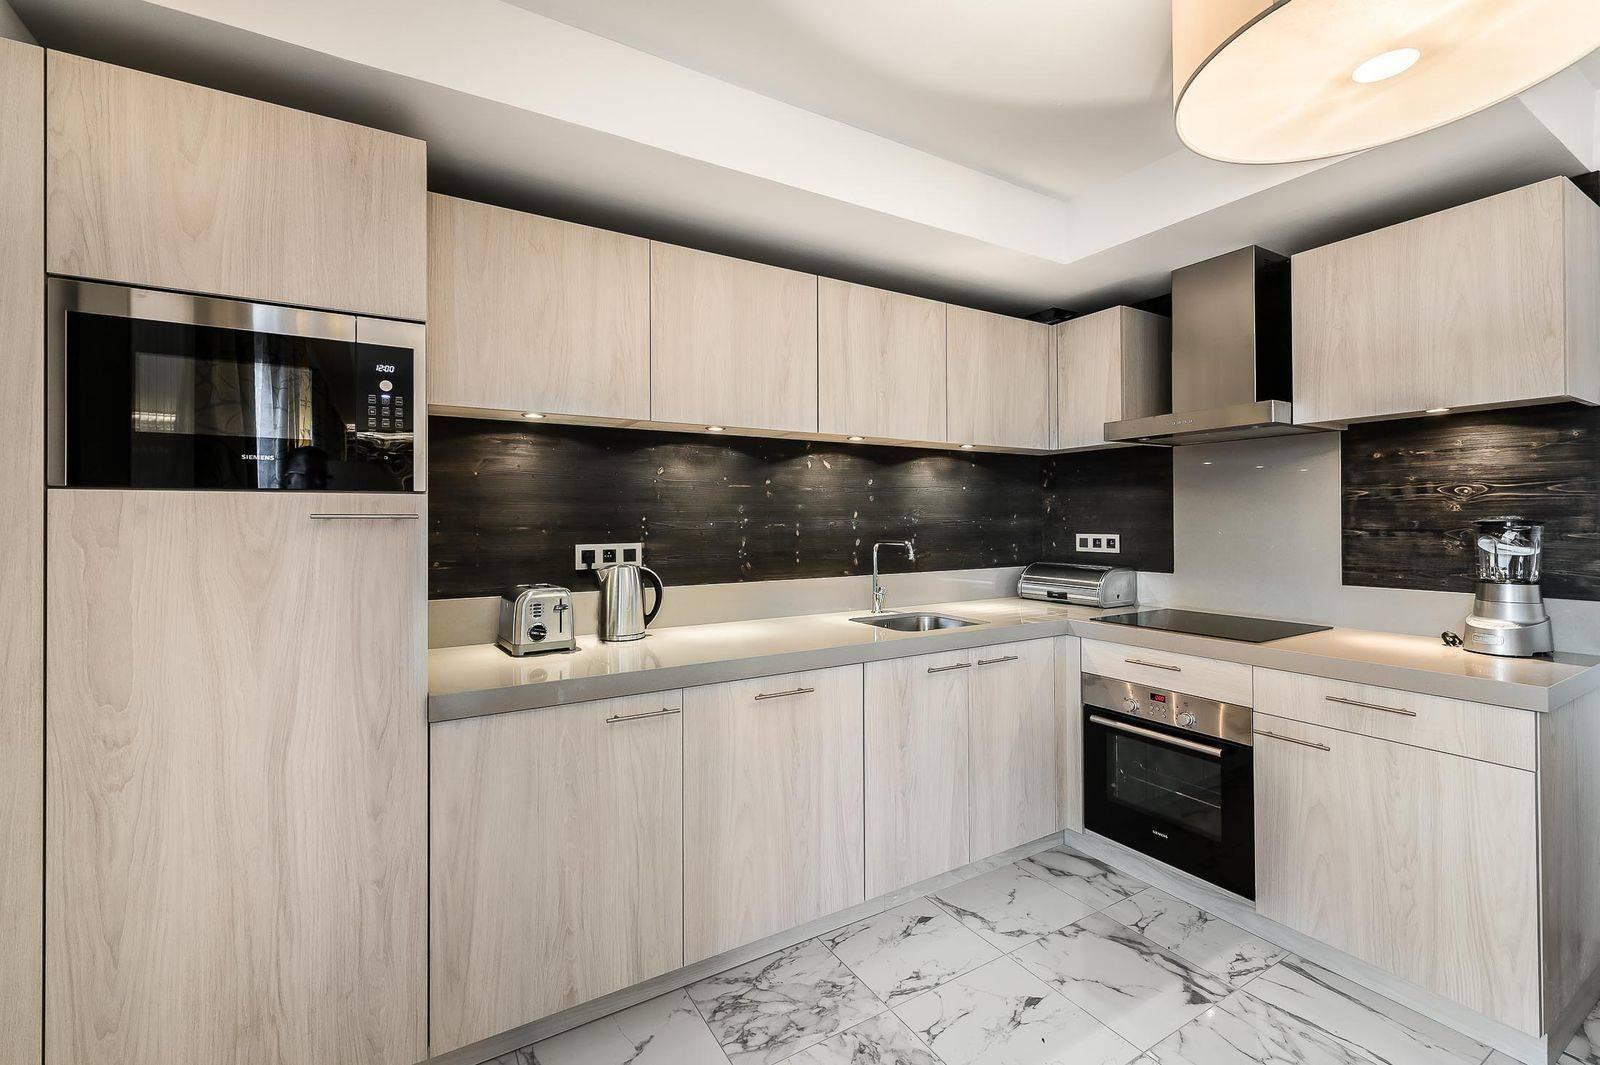 ourchevel 1550 Location Appartement Luxe Telumite Cuisine